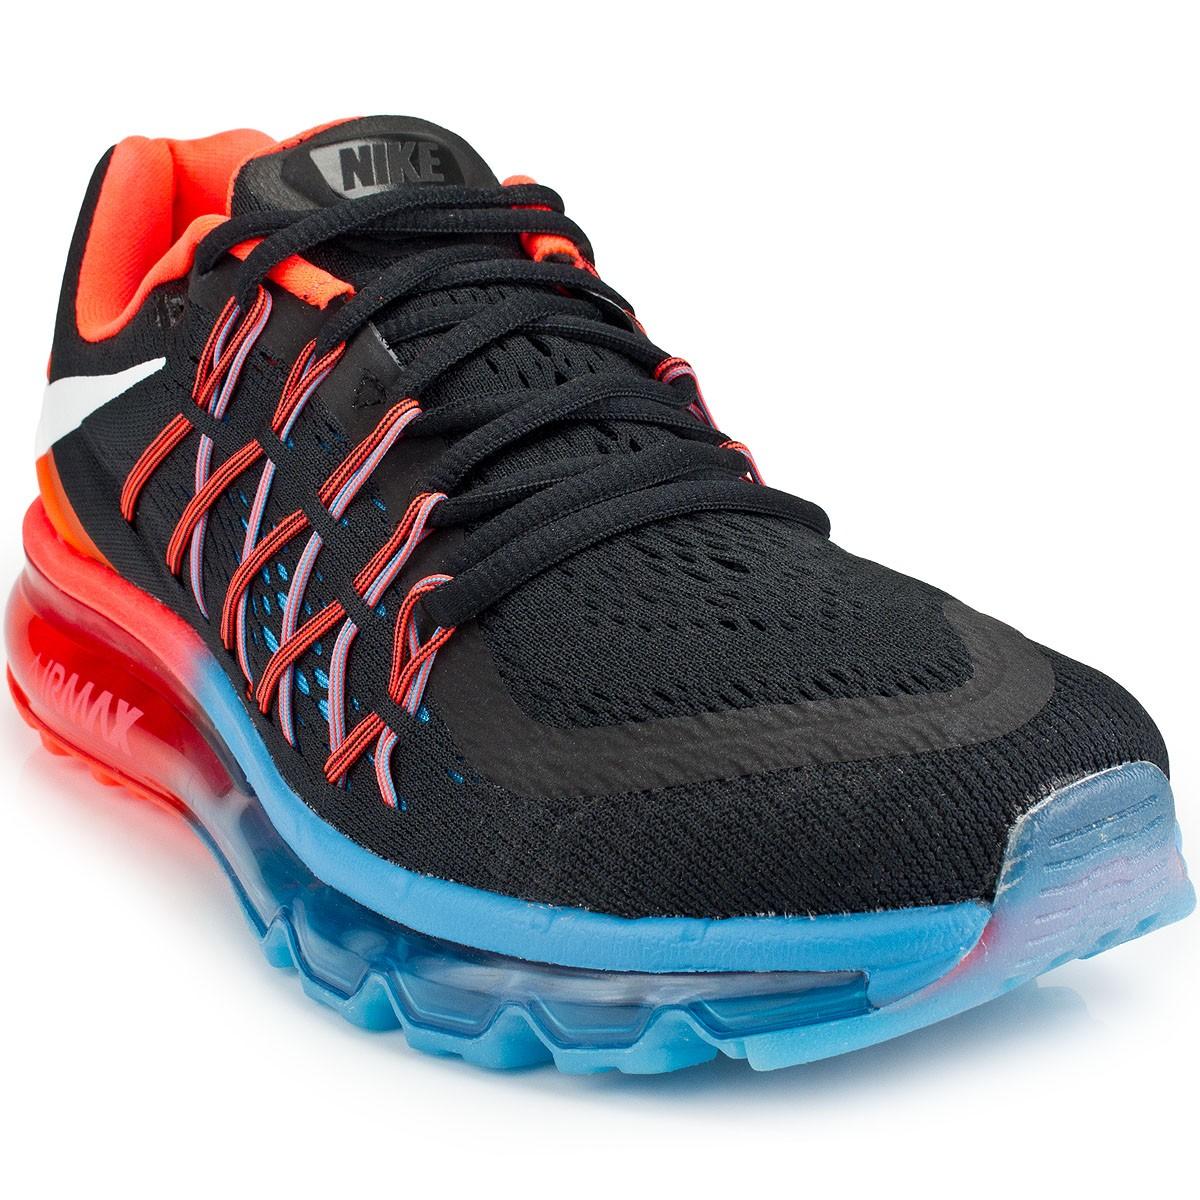 626b89ce822 Tênis Nike Air Max 2015 698902